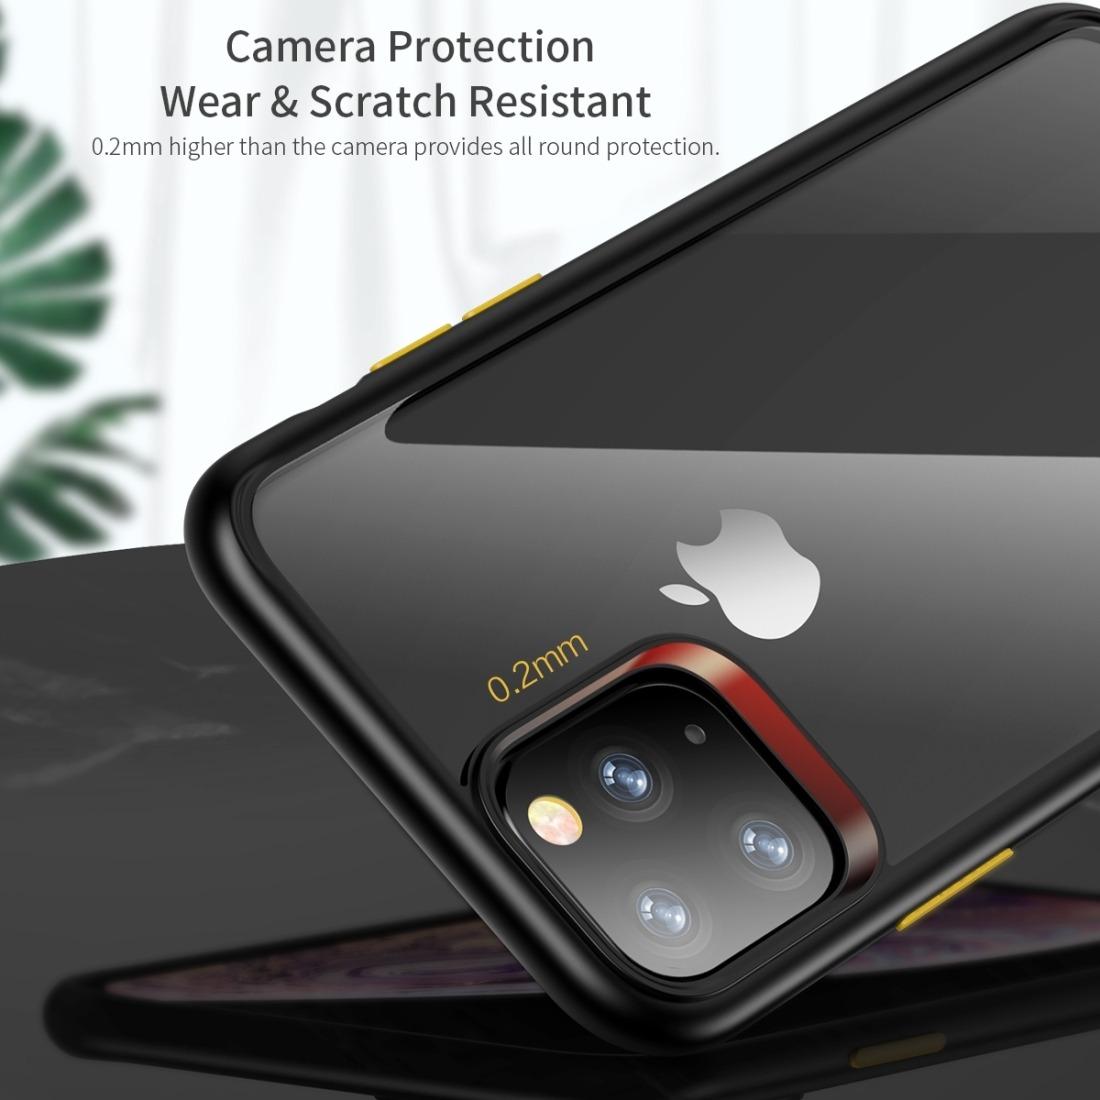 Apple iPhone 4 4s lámina protectora de pantalla Lámina claramente Screen protector protección